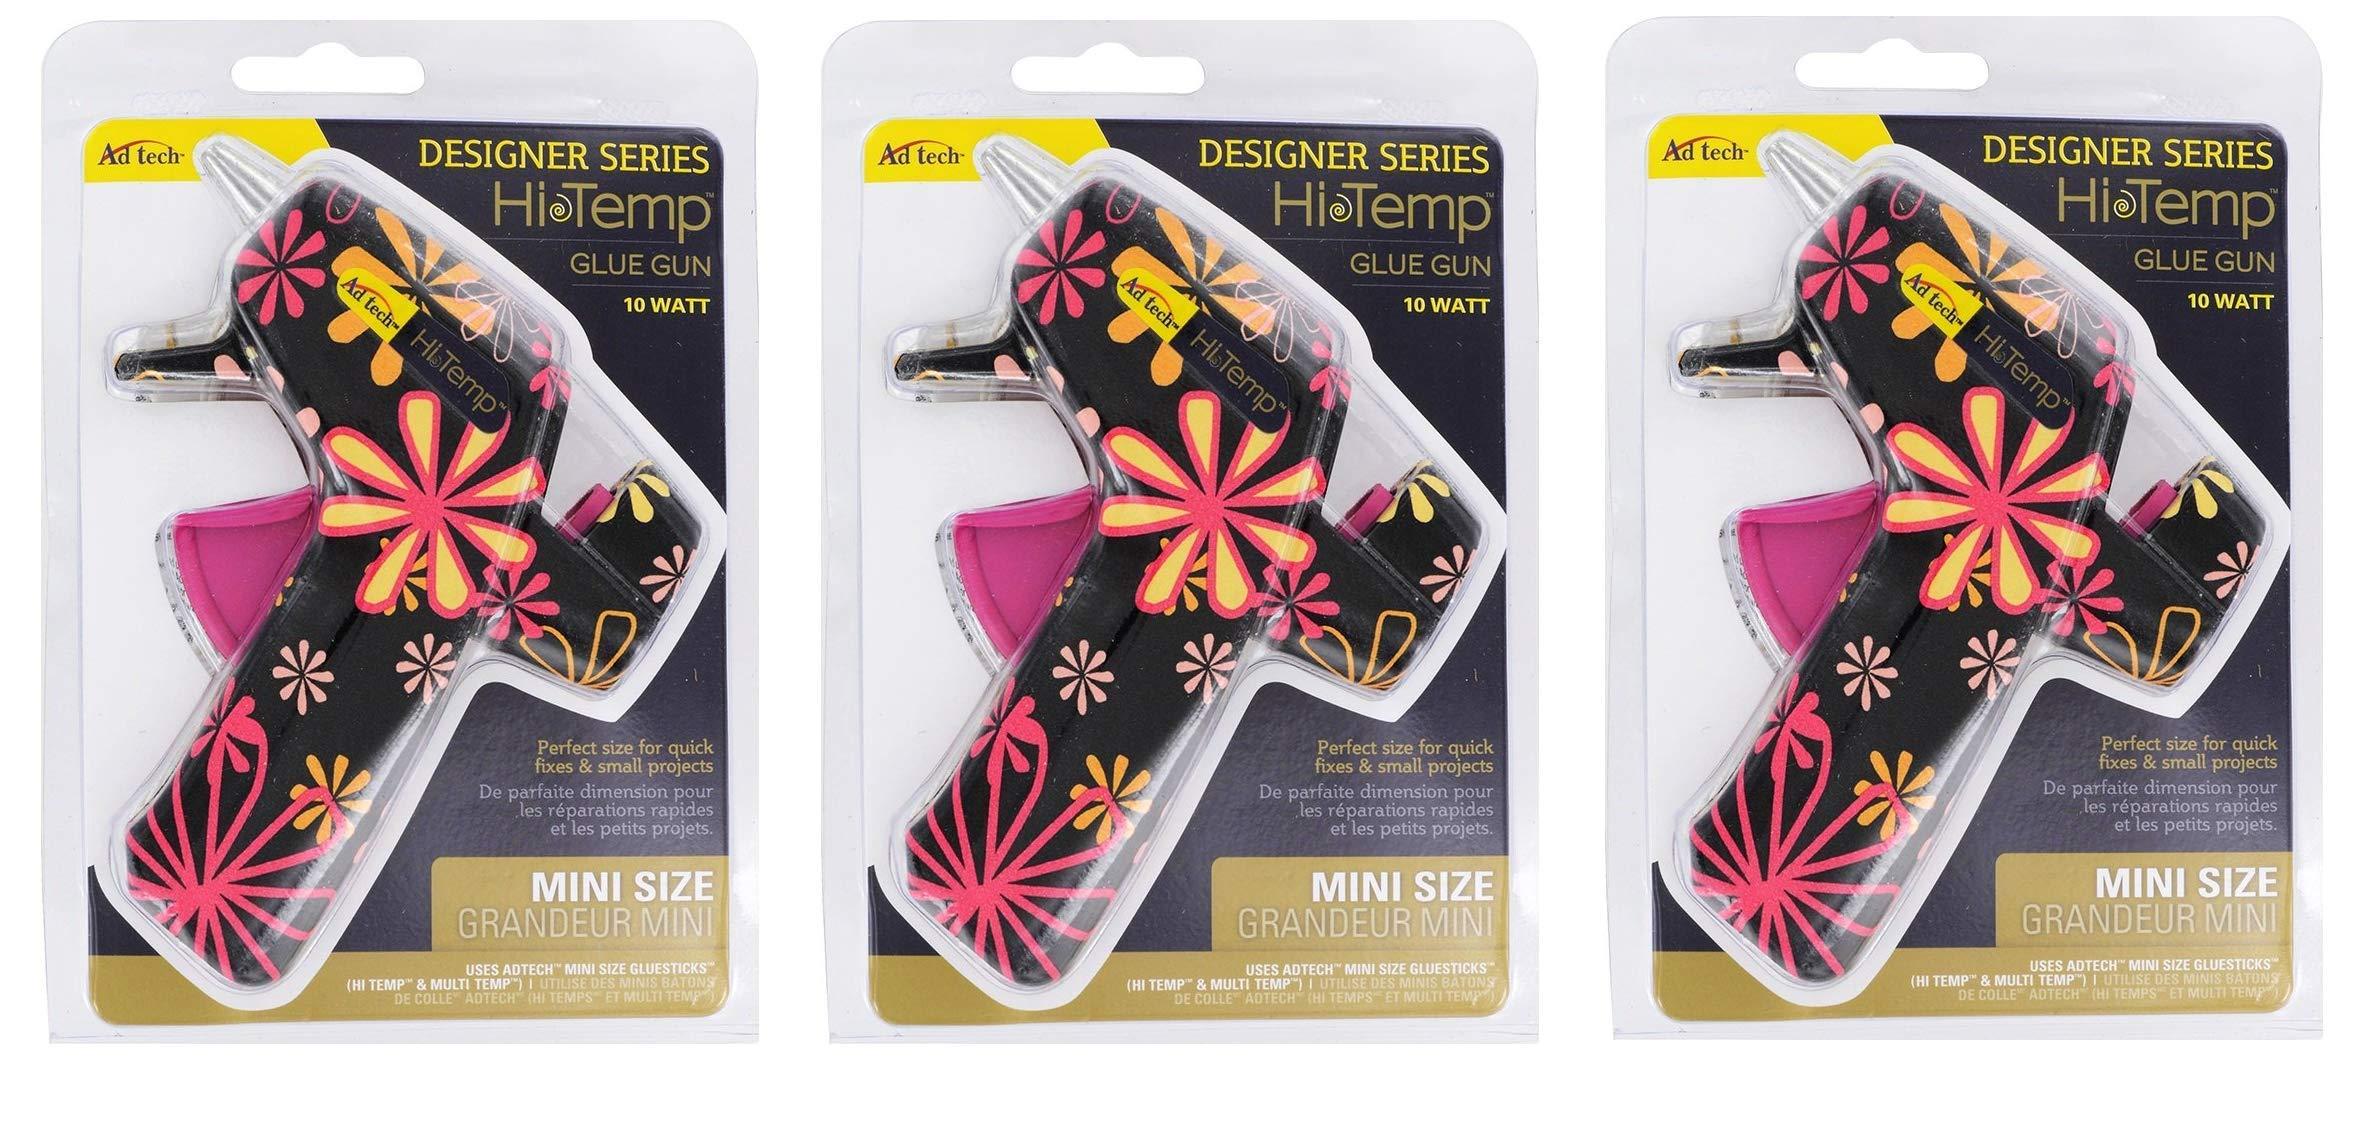 AdTech High Temp Mini Hot Glue Gun in Black Daisy   Arts and Crafts and DIY   Fun and Cute Tool   Item #0502 (Тhree Pаck)